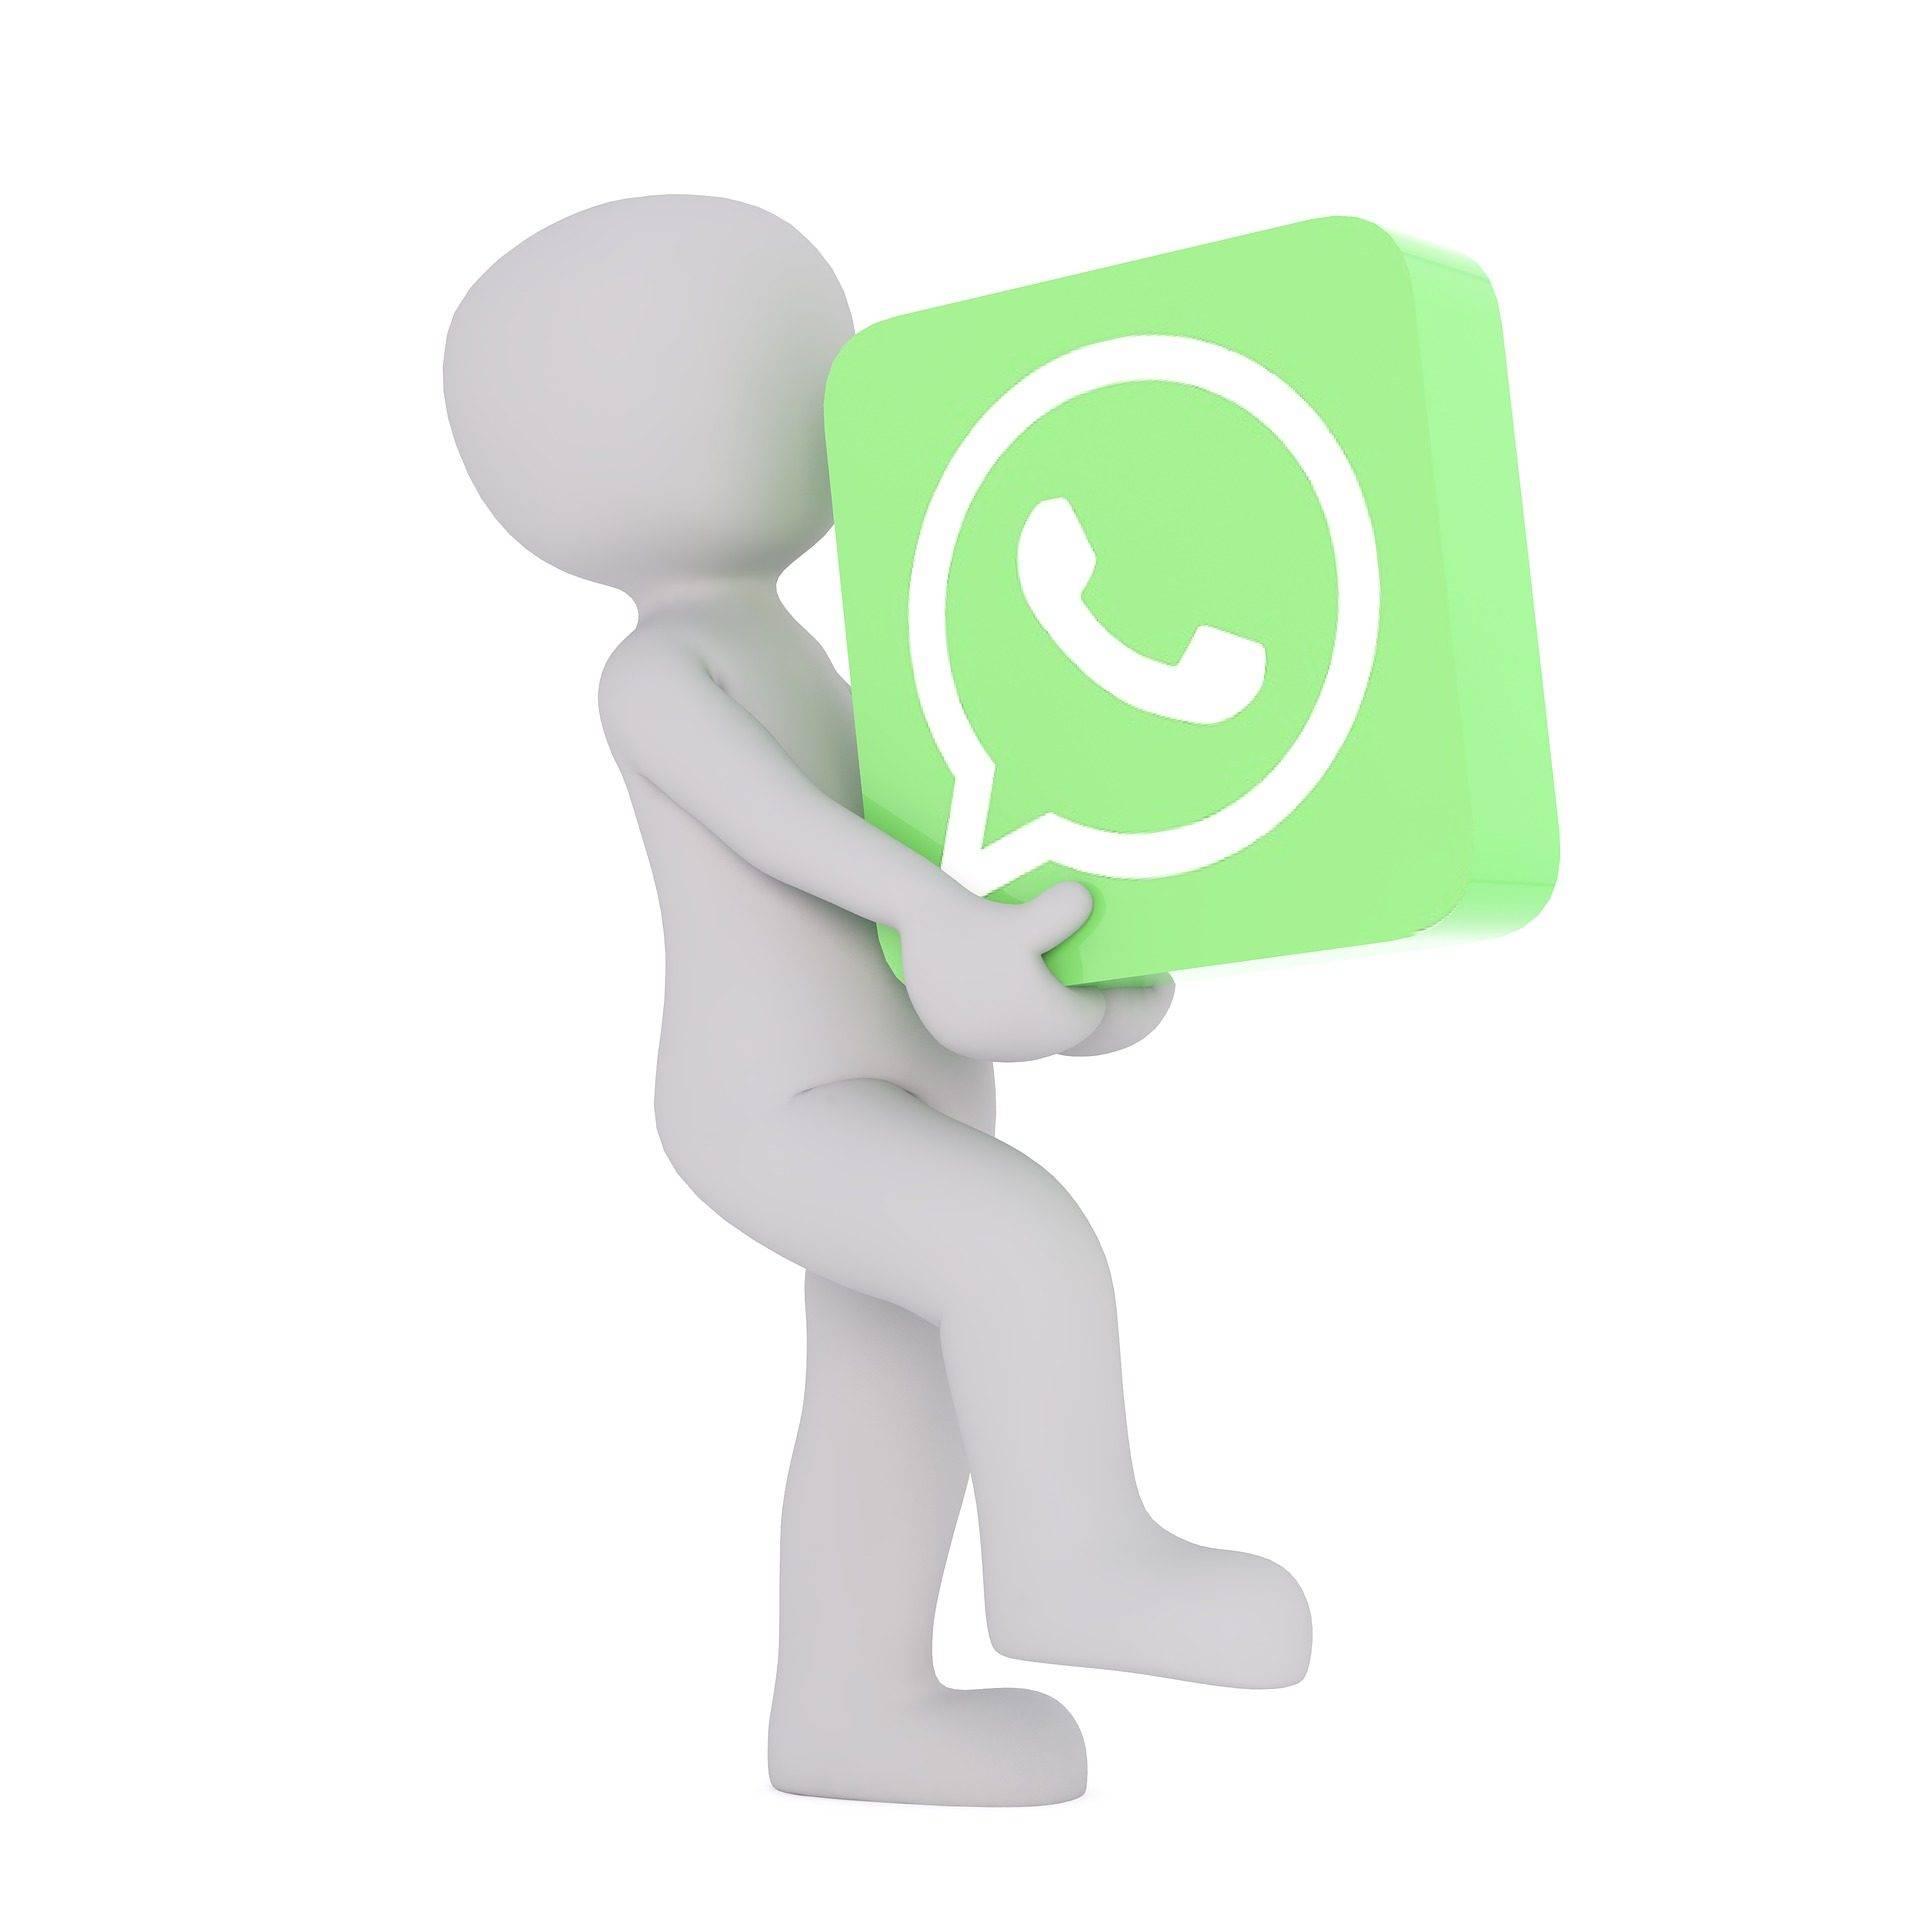 whatsapp als kommunikationskanal f r unternehmen tel inform. Black Bedroom Furniture Sets. Home Design Ideas